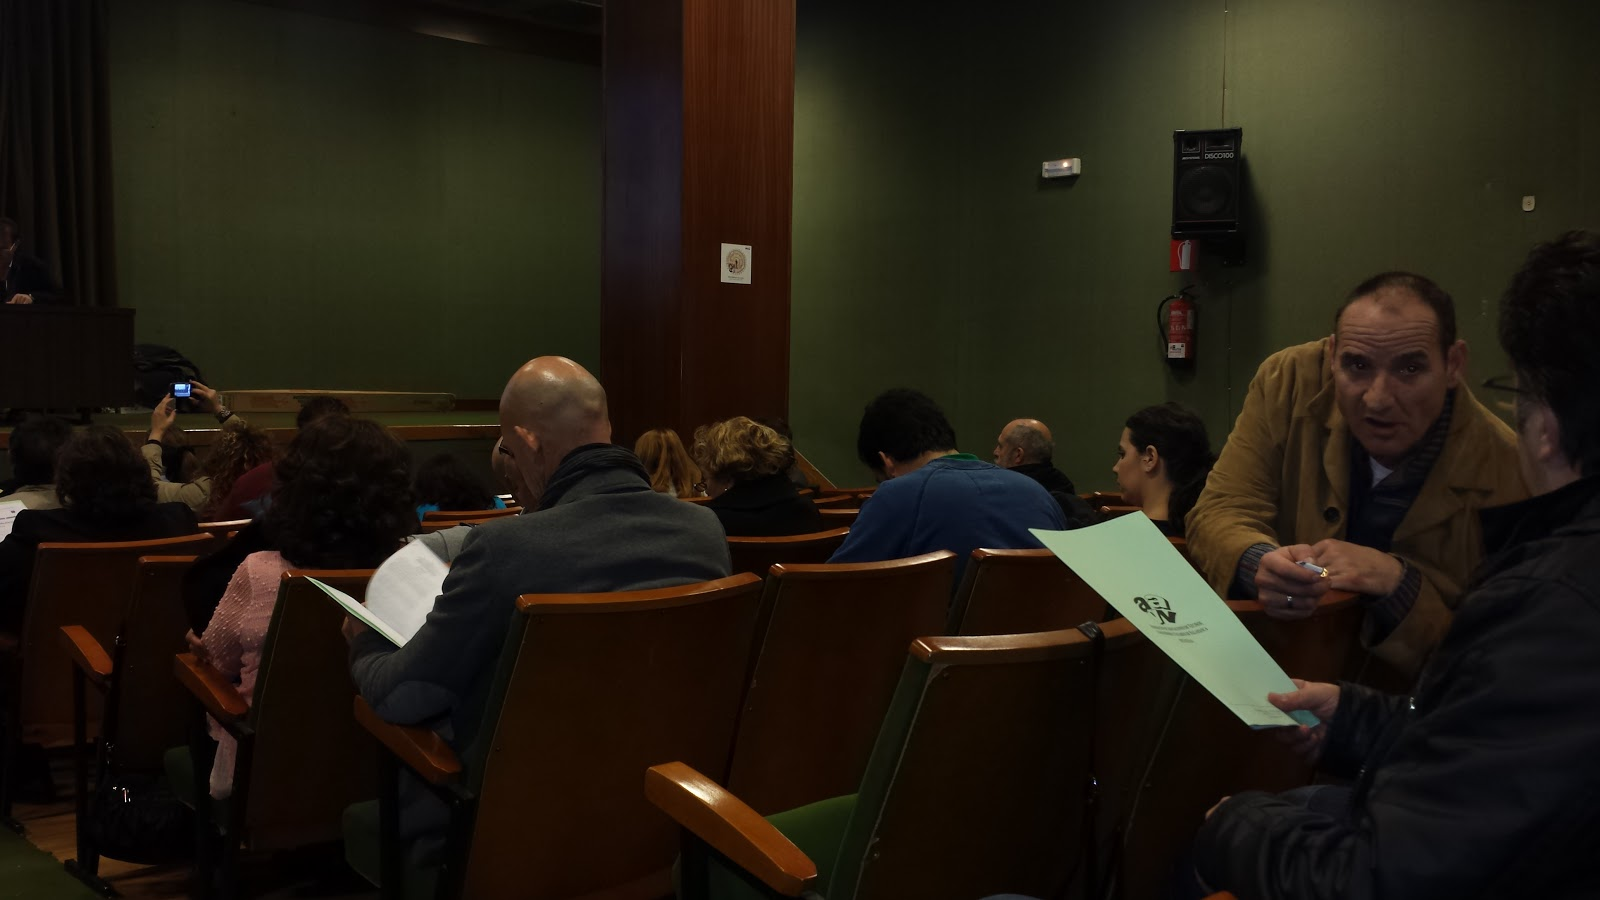 asistentes a la asamble ageneral FEVESA 2014 en Béjar